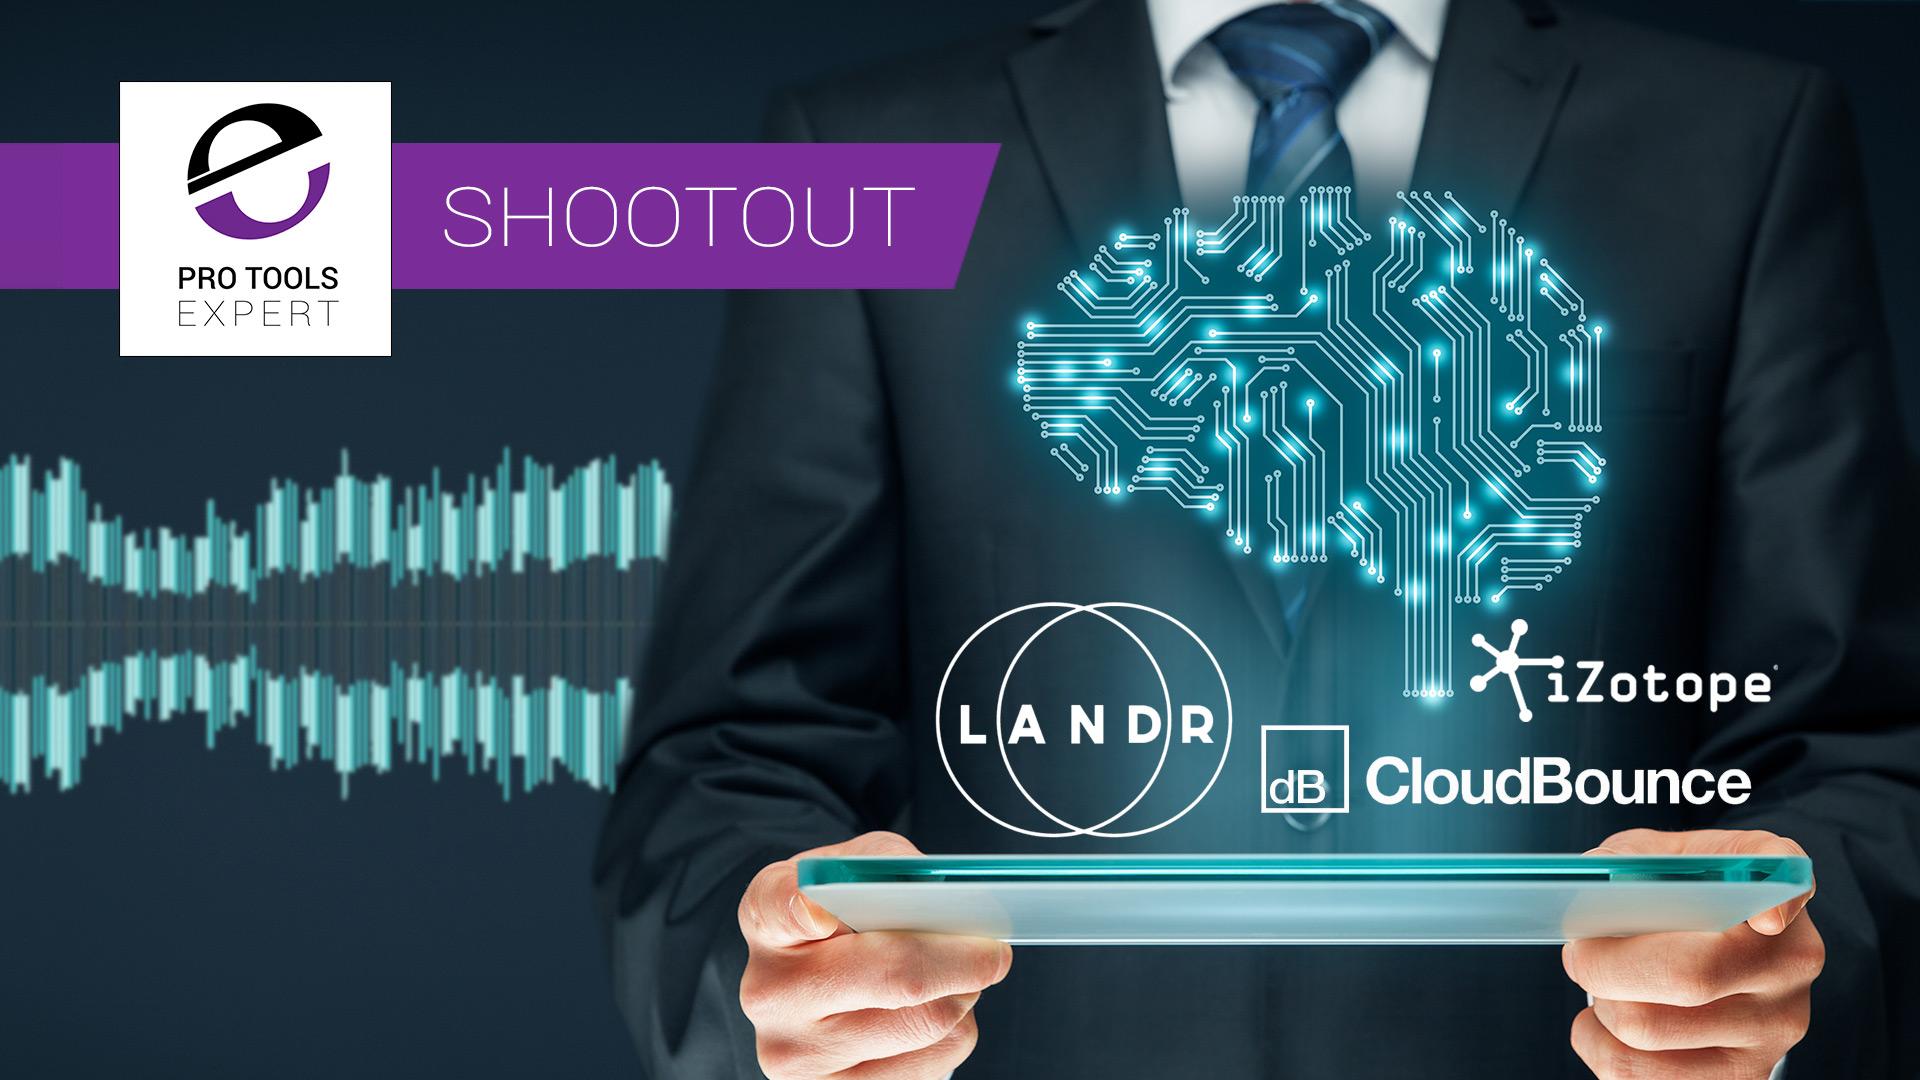 mastering-shootout-LANDR-Cloudbounce-izotope-ozone-8-mastering-assistant.jpg